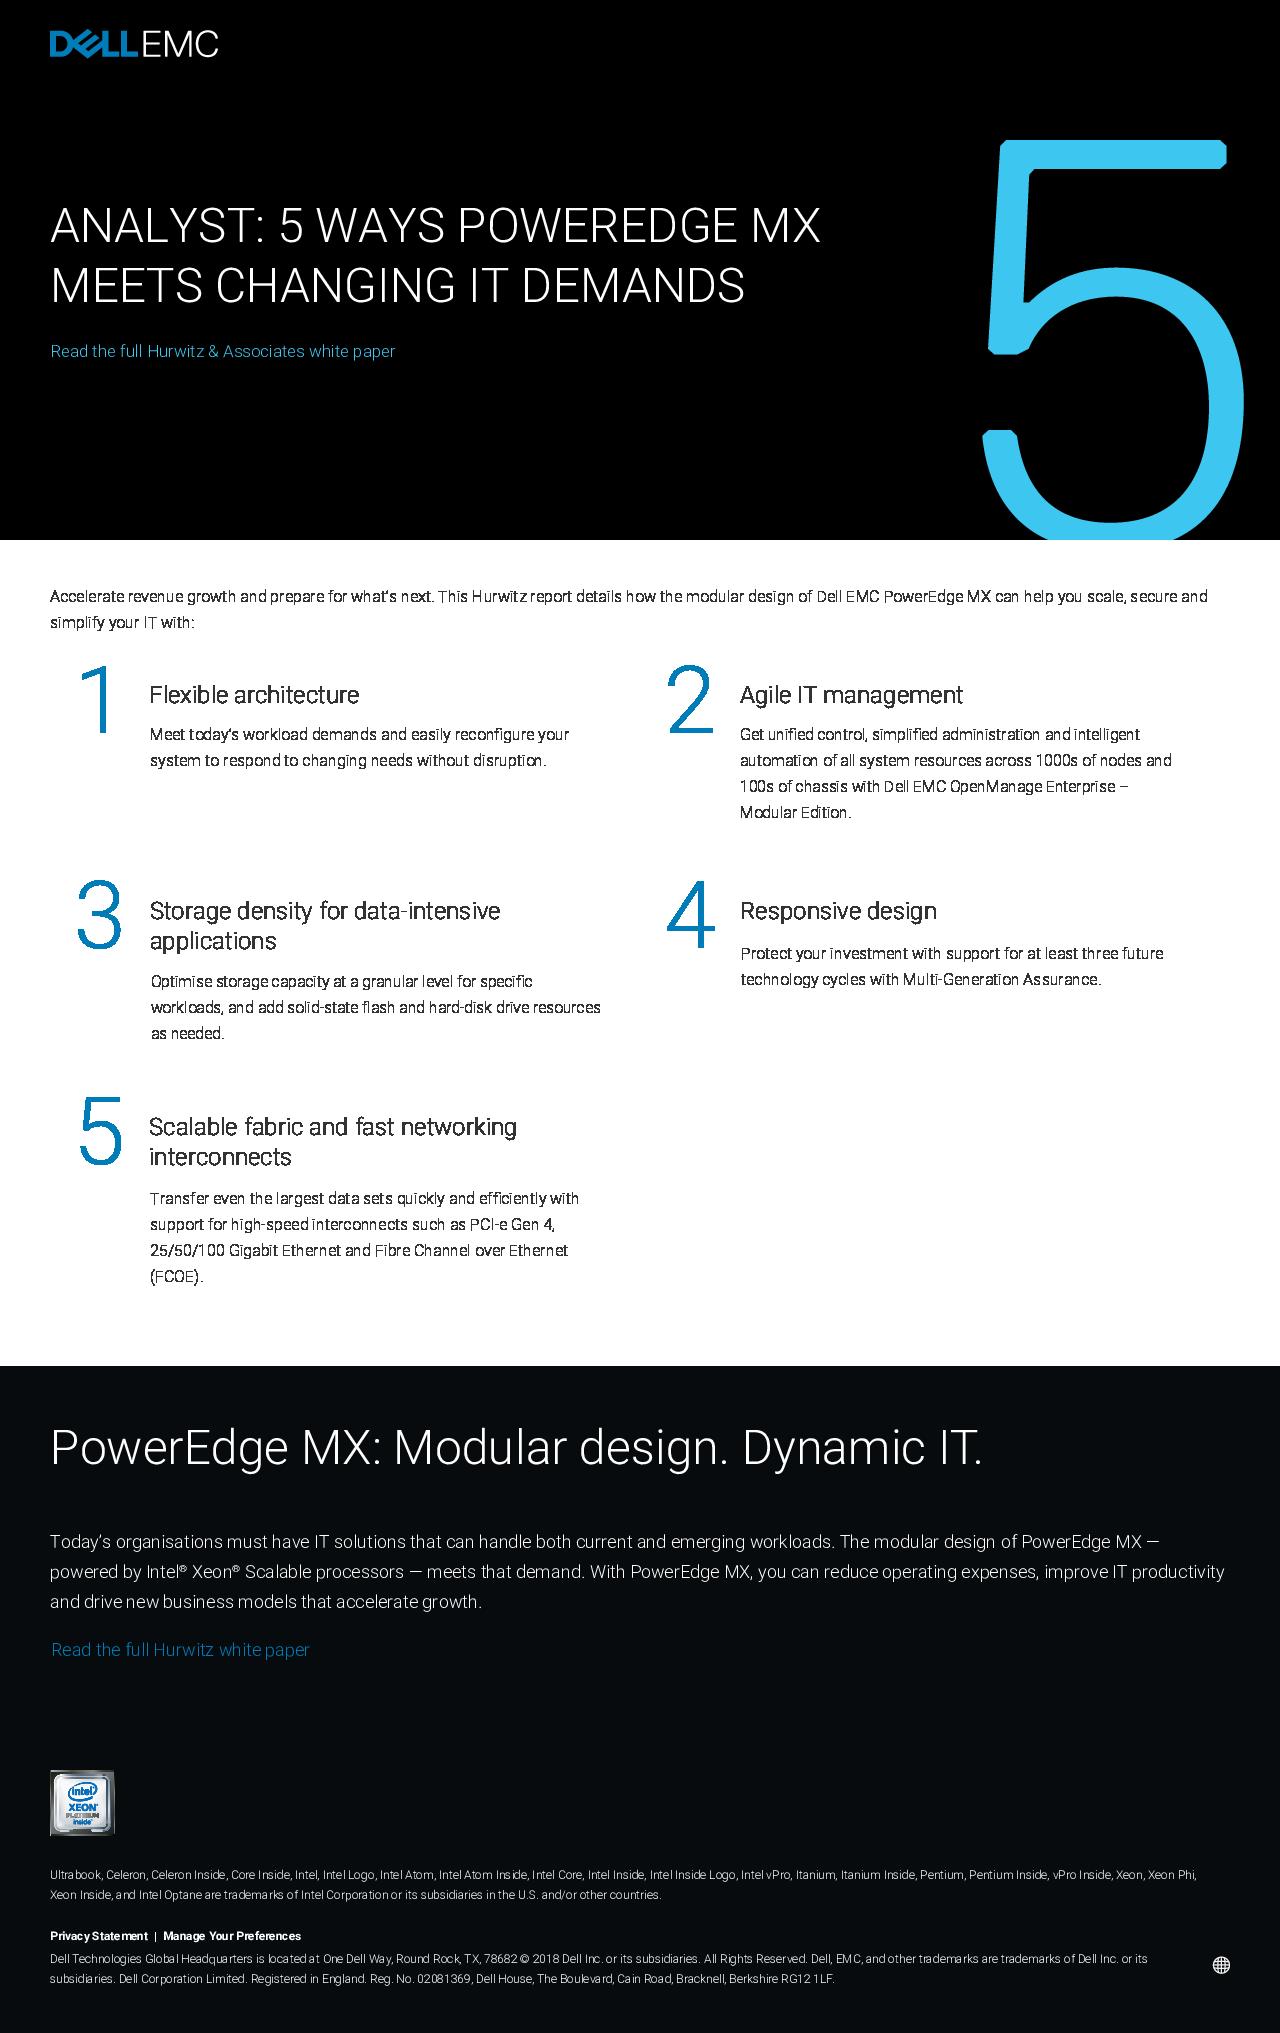 Square cropped thumb original dellemc 5 ways poweredge mx meets changing it demands 18354  17be1dd2e575d205